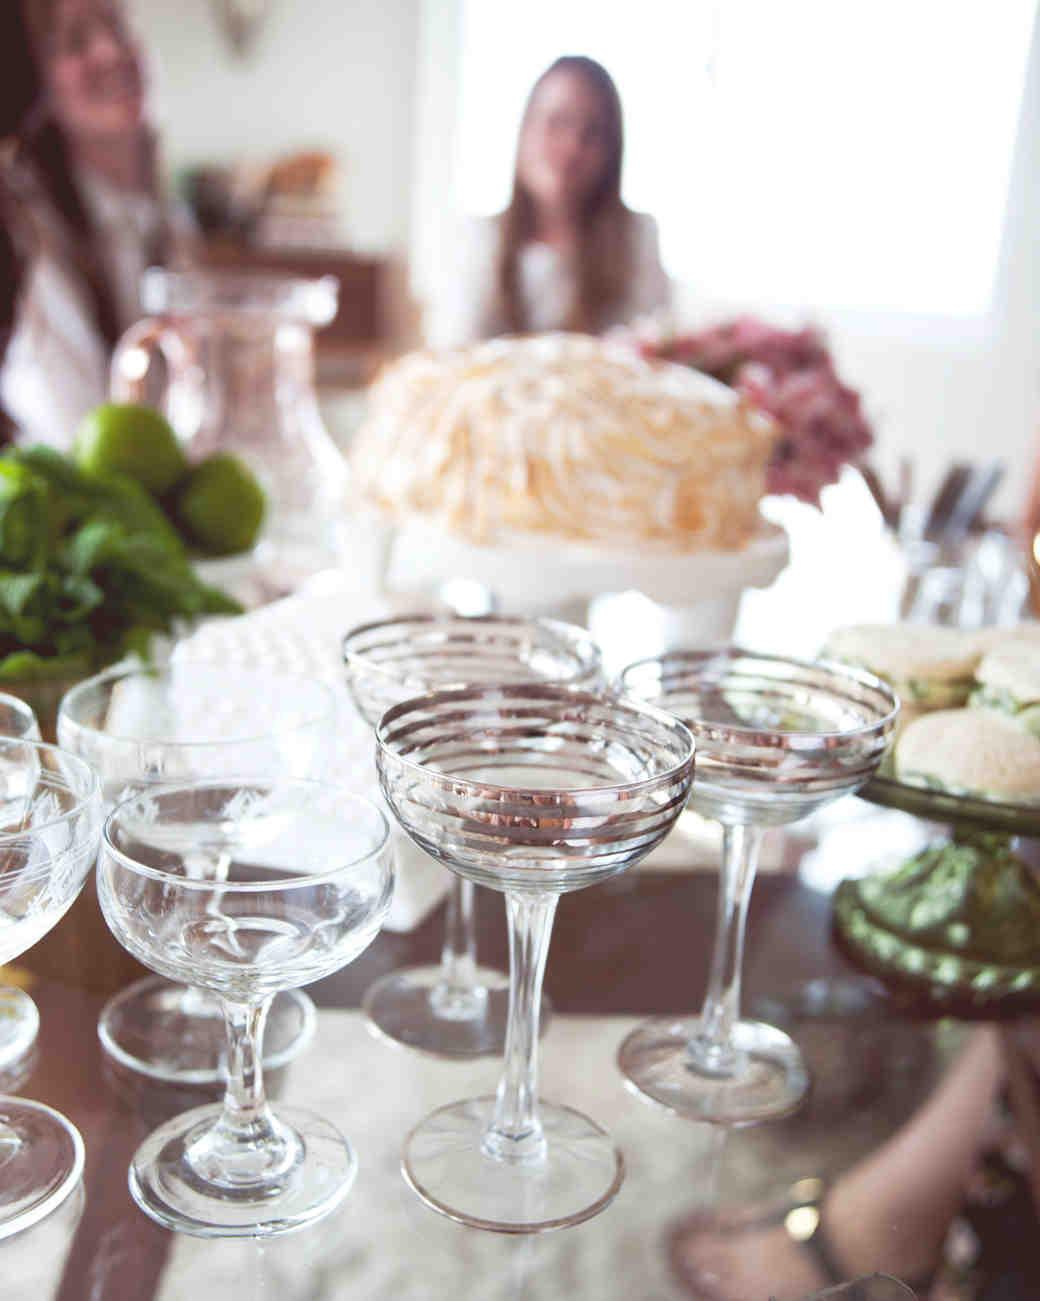 claire-thomas-bridal-shower-vintage-glasses-table-0814.jpg